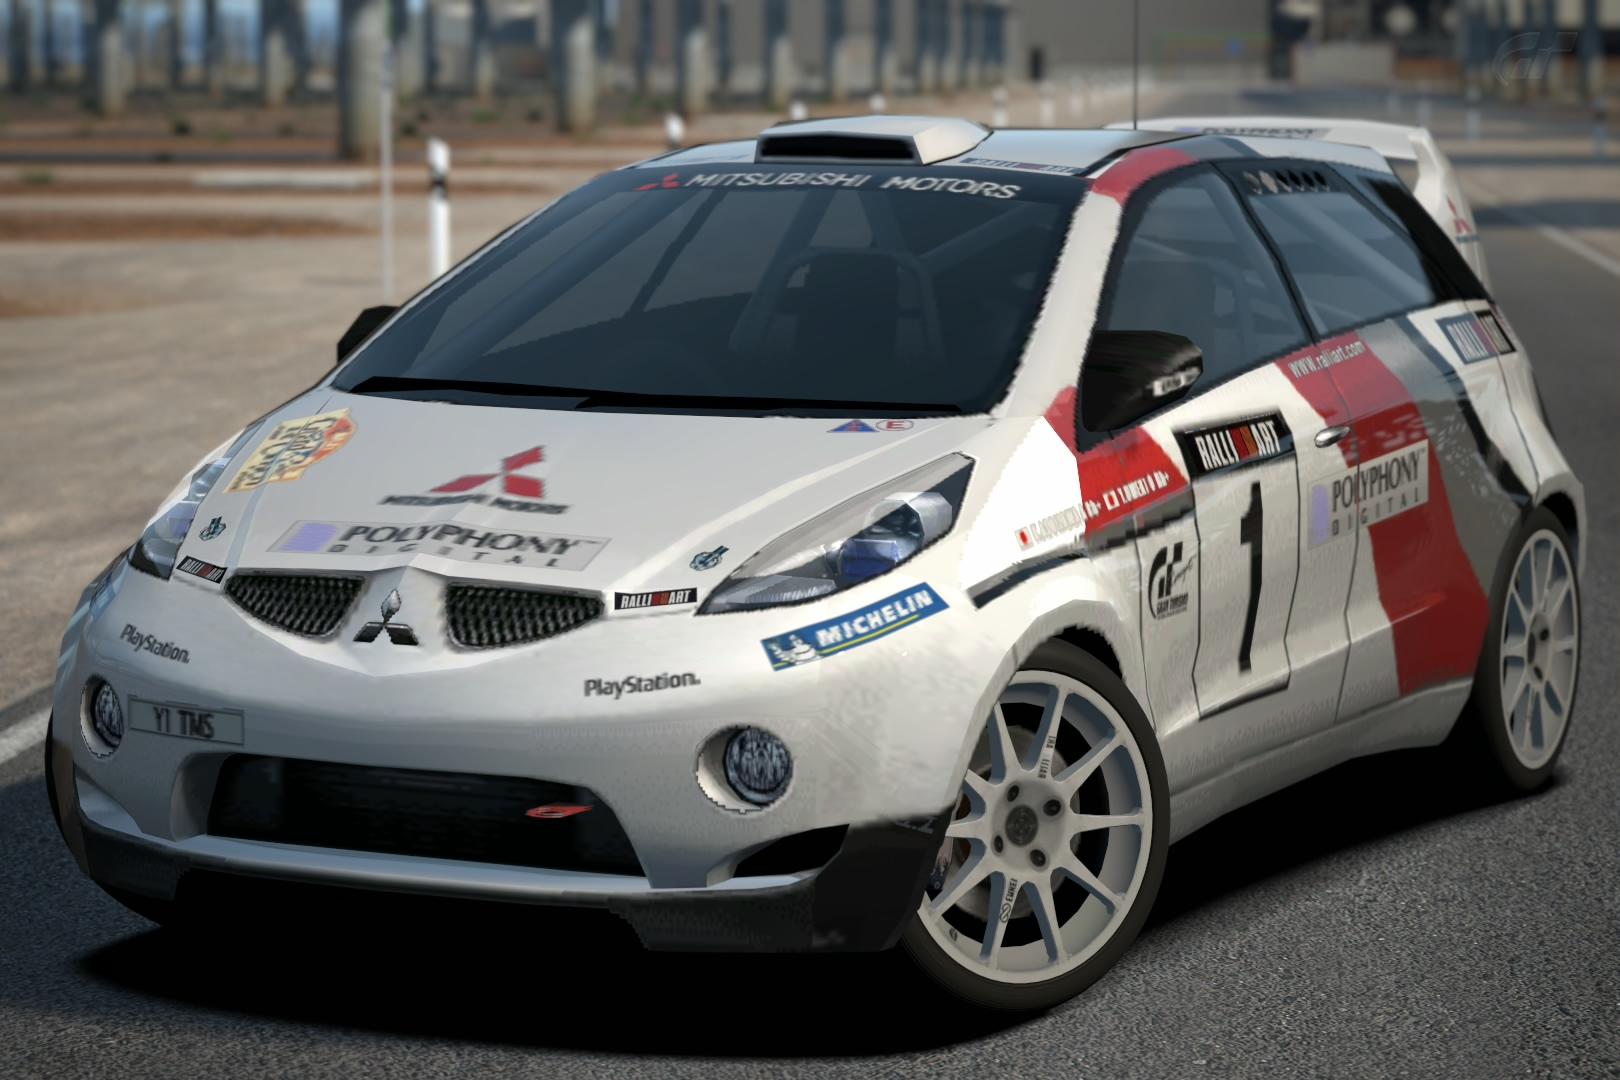 Mitsubishi Cz 3 Tarmac Rally Car Gran Turismo Wiki Fandom